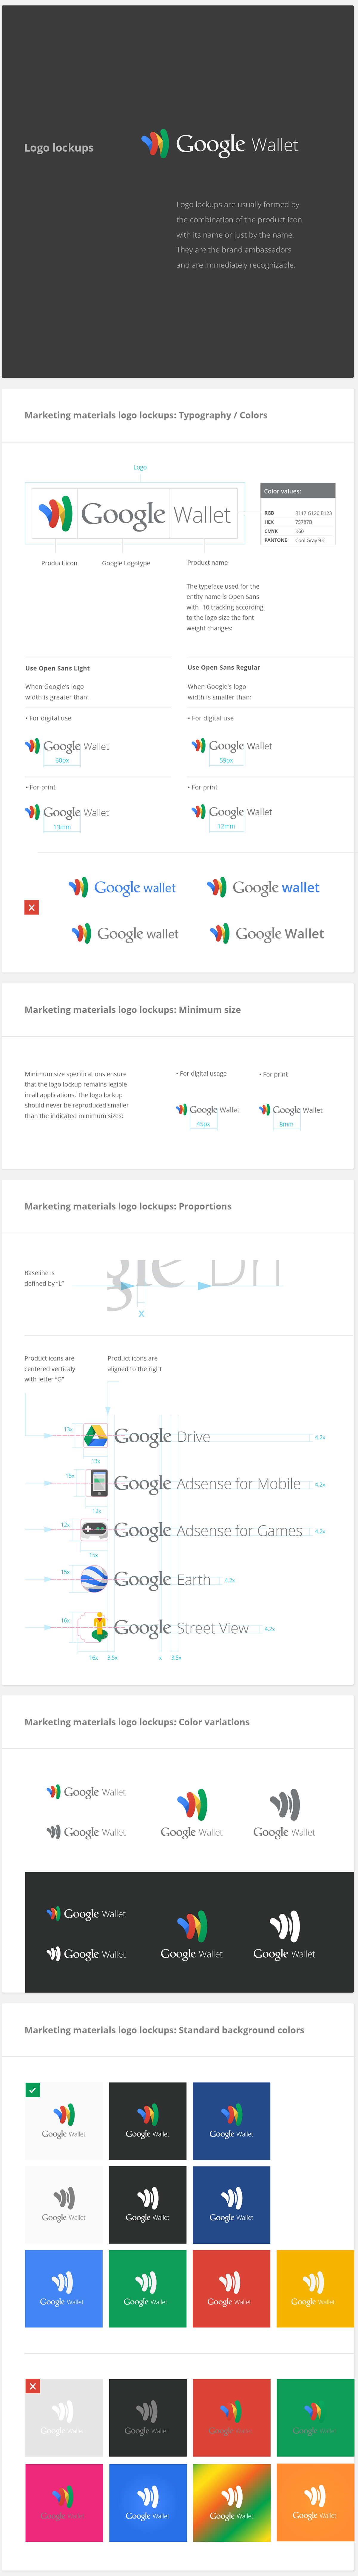 google visual assets guidelines Alex Griendling Jefferson Cheng Zachary Gibson Christopher Bettig yan yan Style Guide Roger ddone